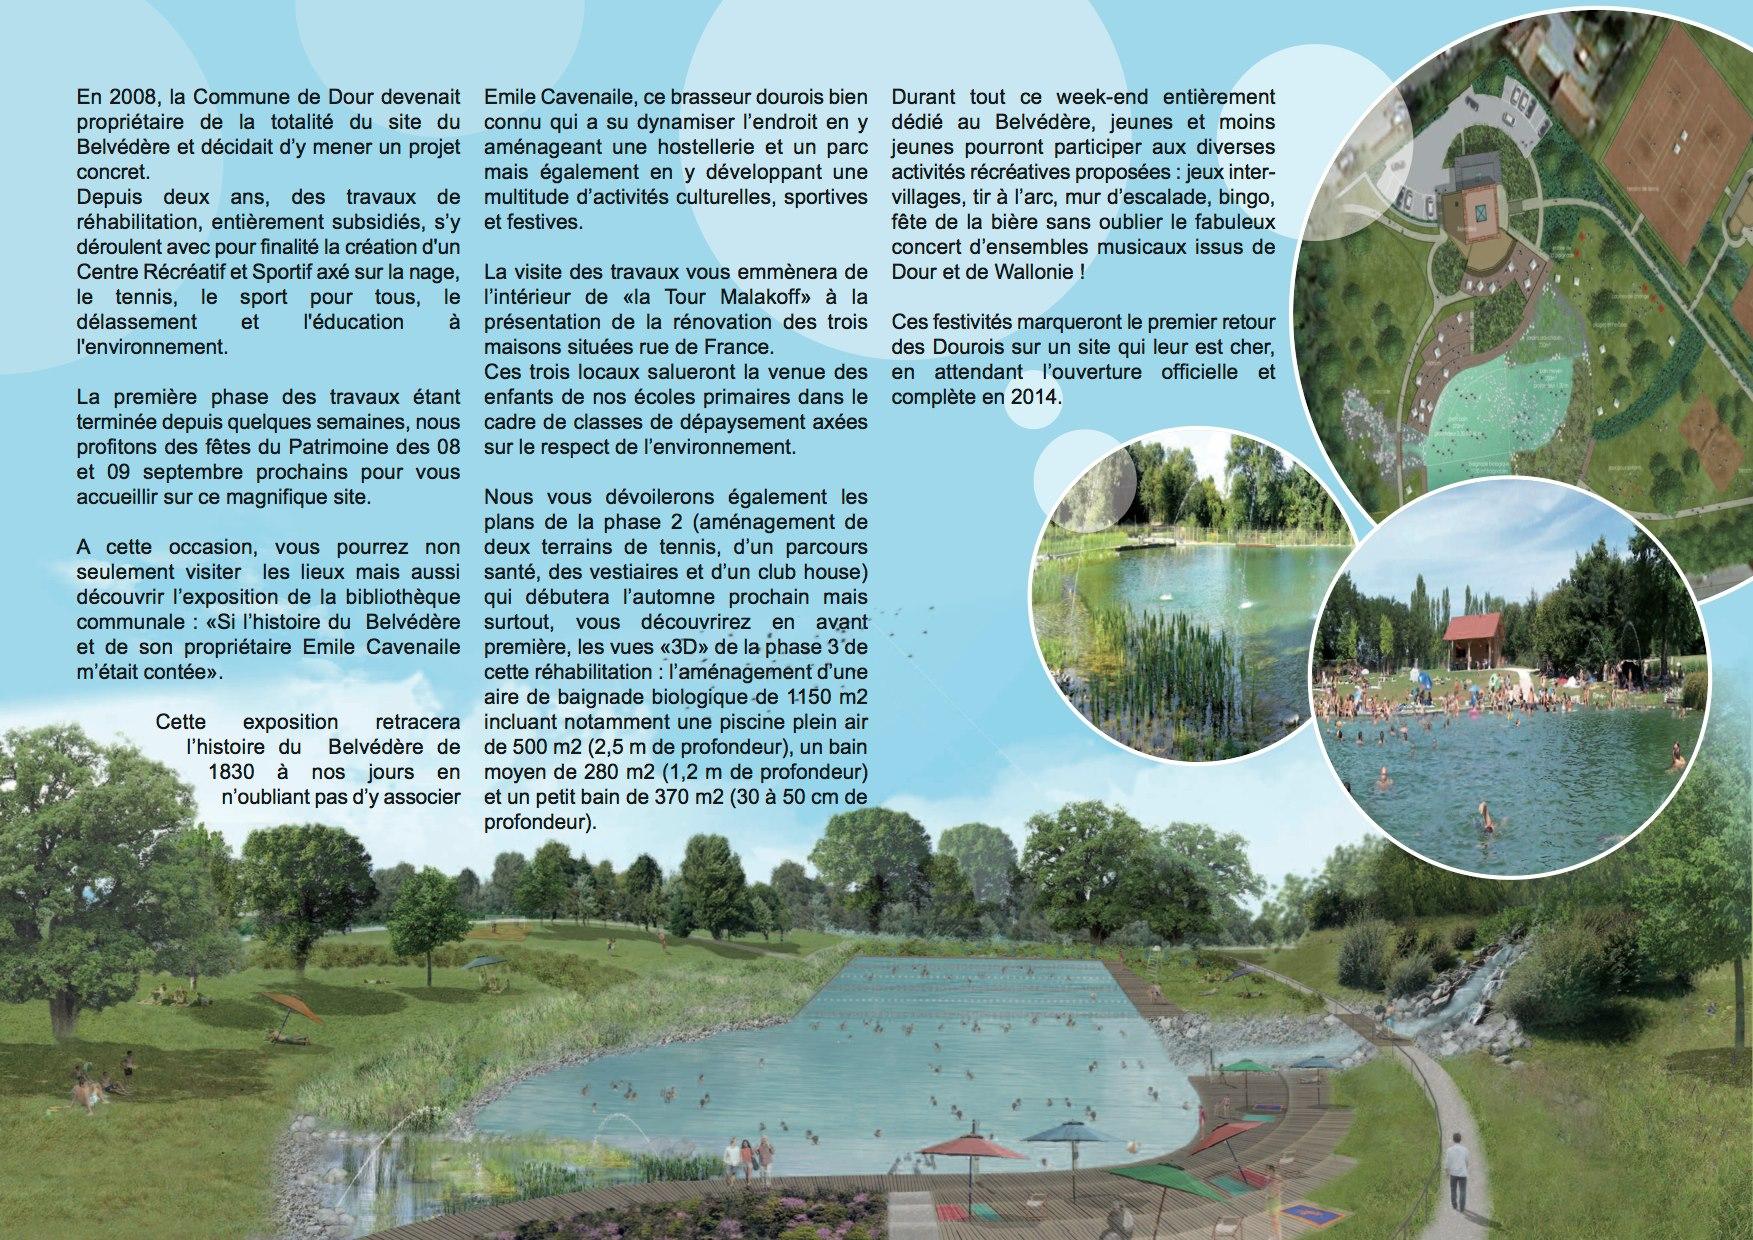 Plongez dans la premi re piscine bio de belgique for Prix piscine biologique